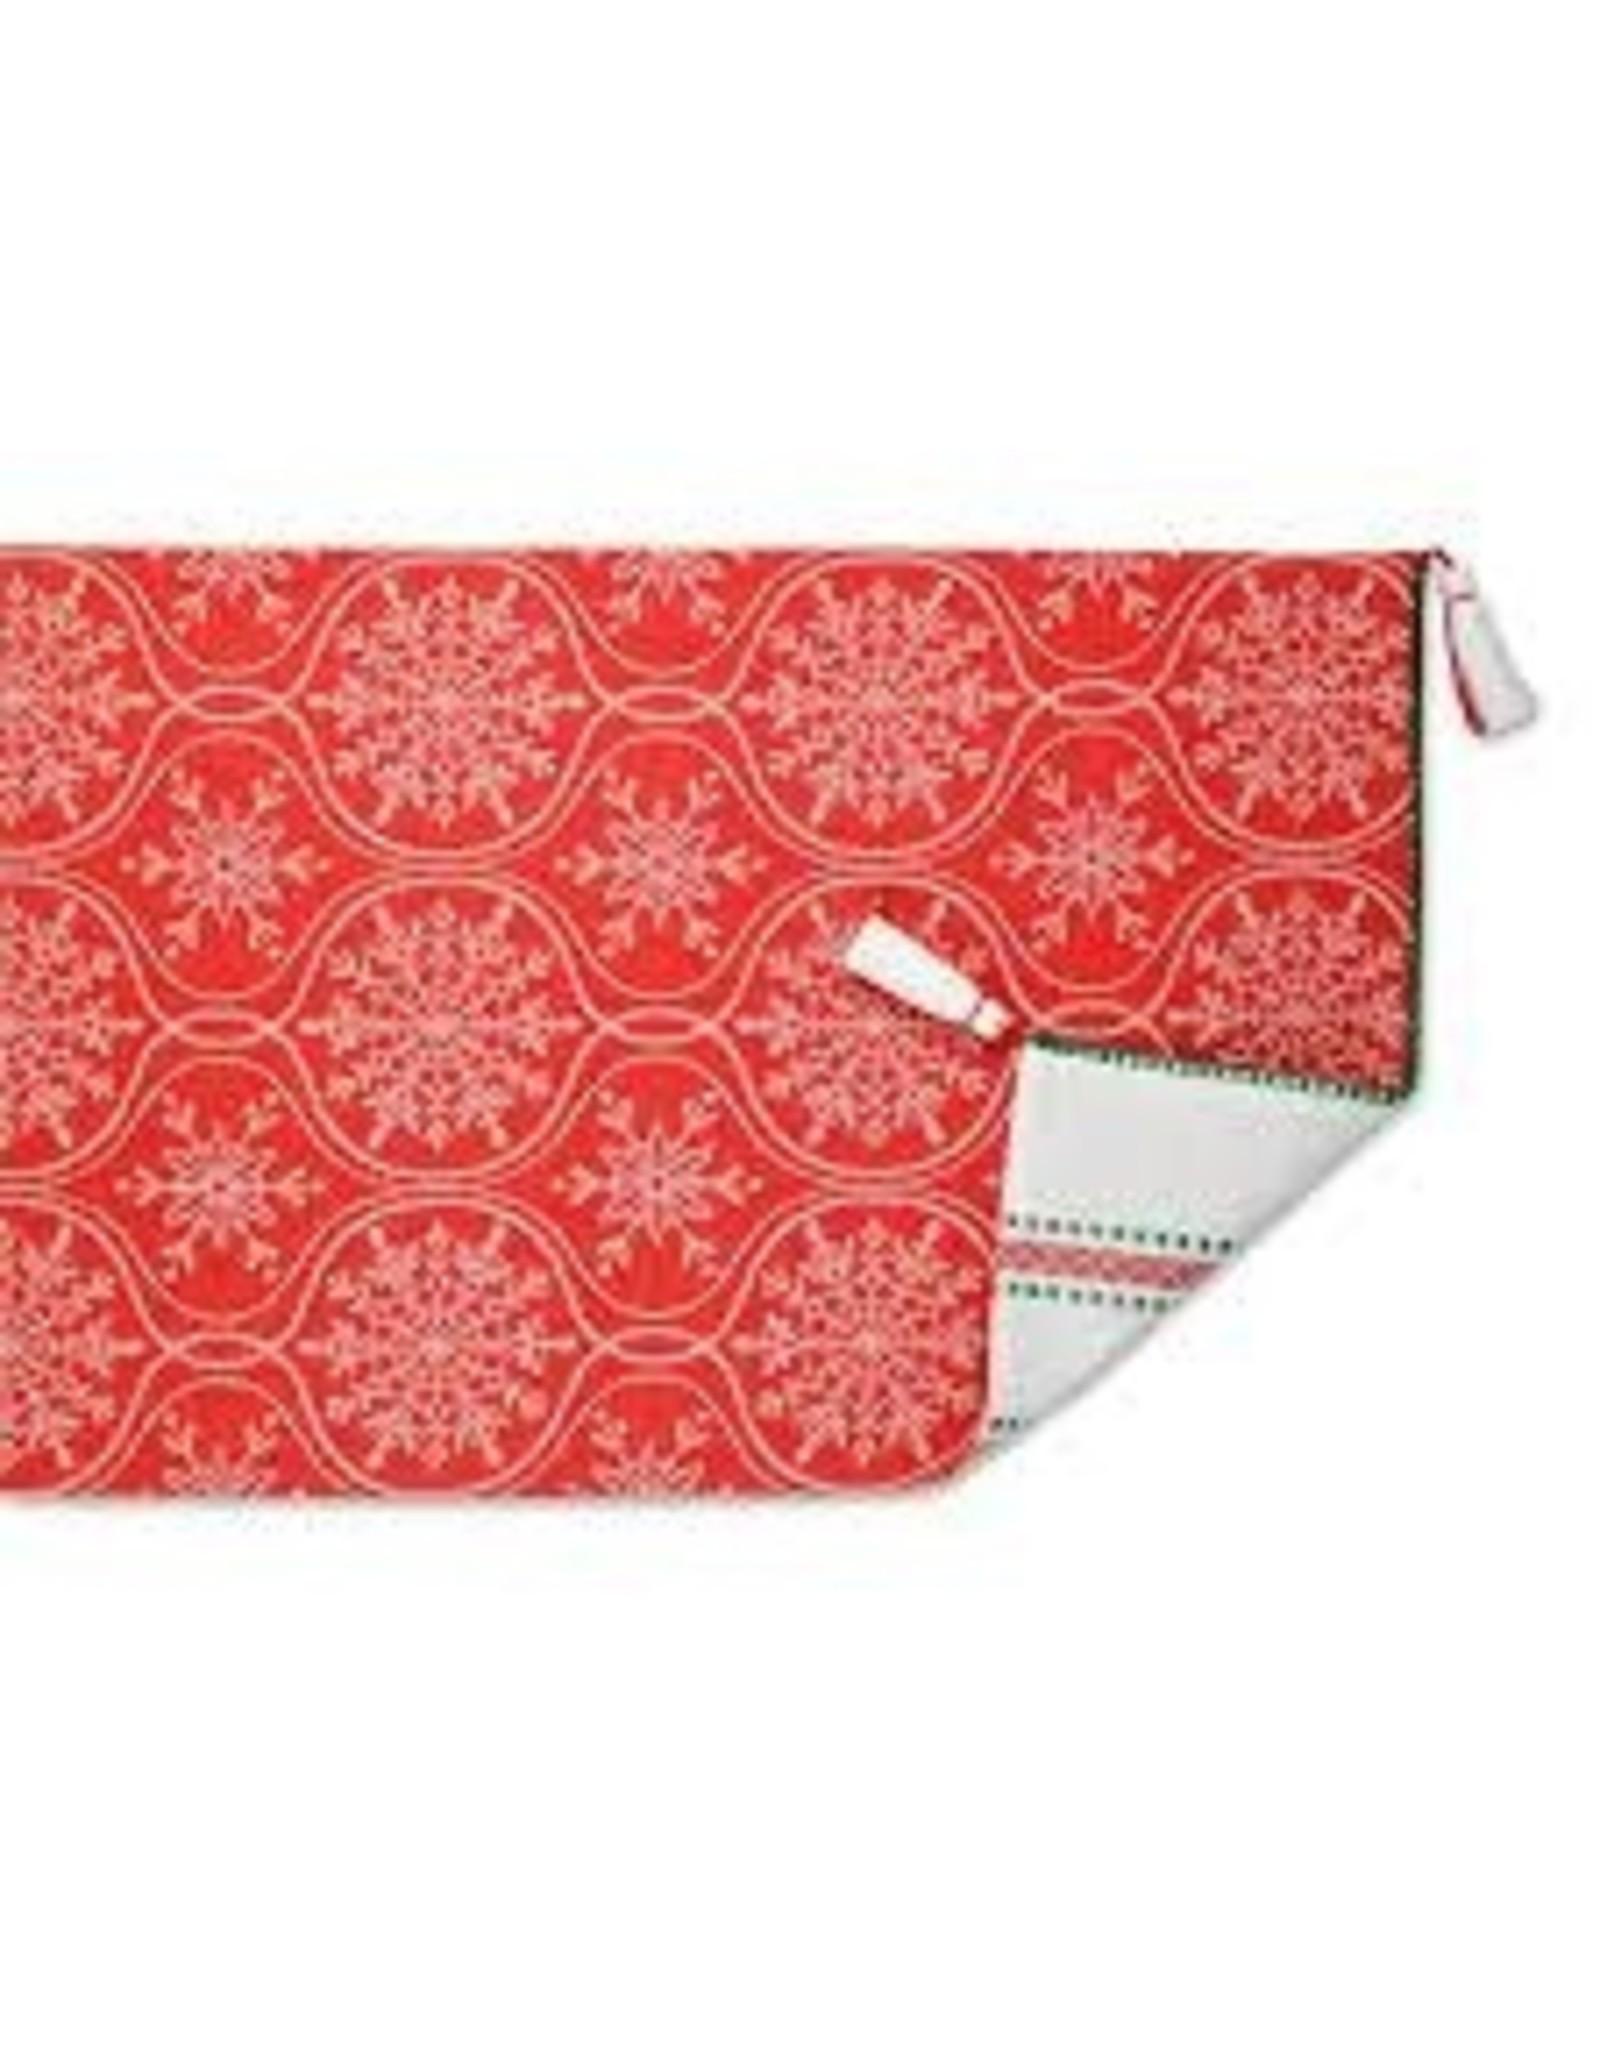 Design Imports DI Joyful Snowflakes Placemat